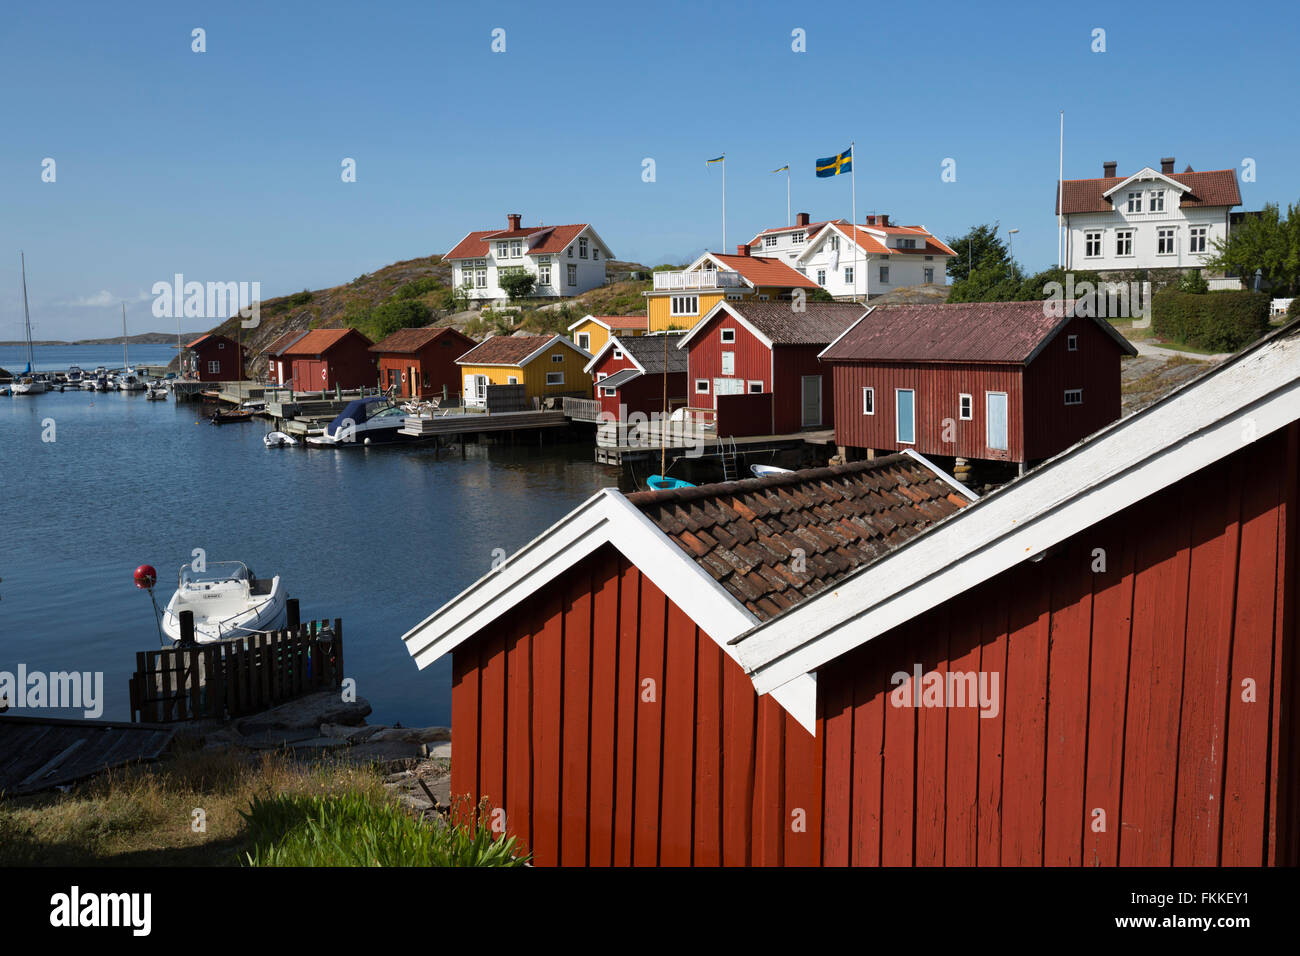 Falu red fishermen's houses in harbour, Hälleviksstrand, Orust, Bohuslän Coast, Southwest Sweden, Sweden, Scandinavia, Stock Photo